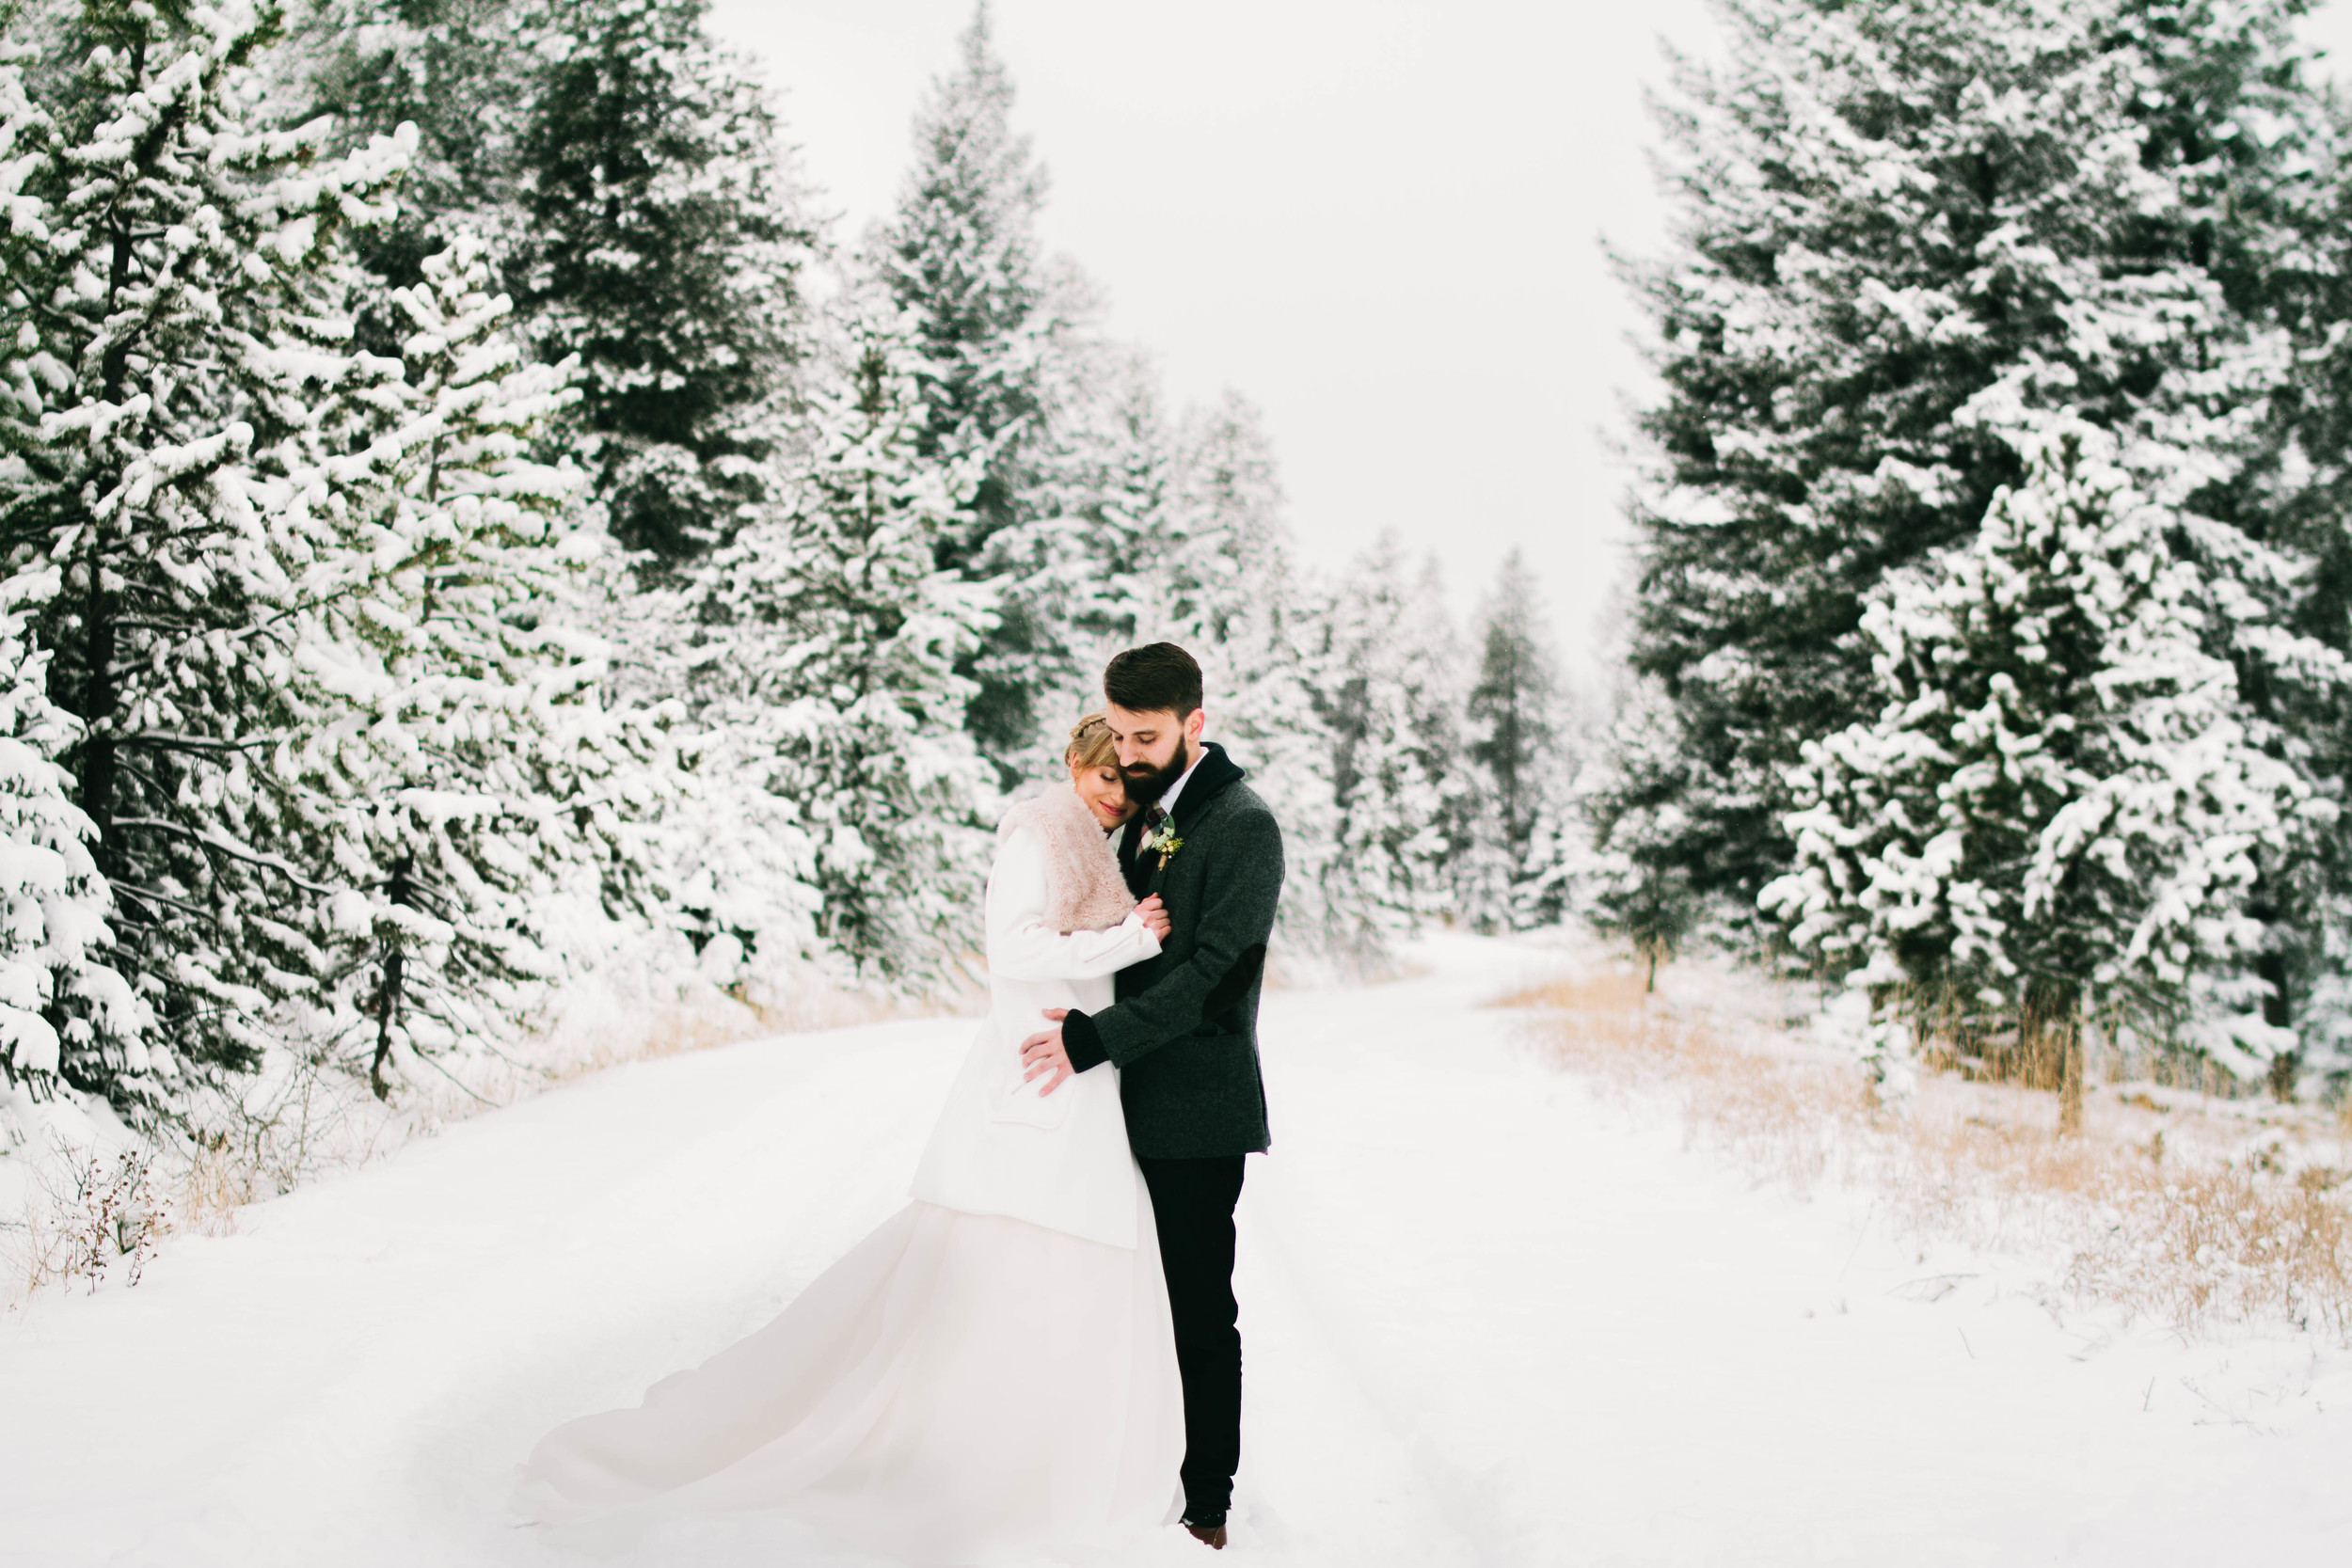 Bonin Wedding - Madeleine Bonin Photography-5750.jpg